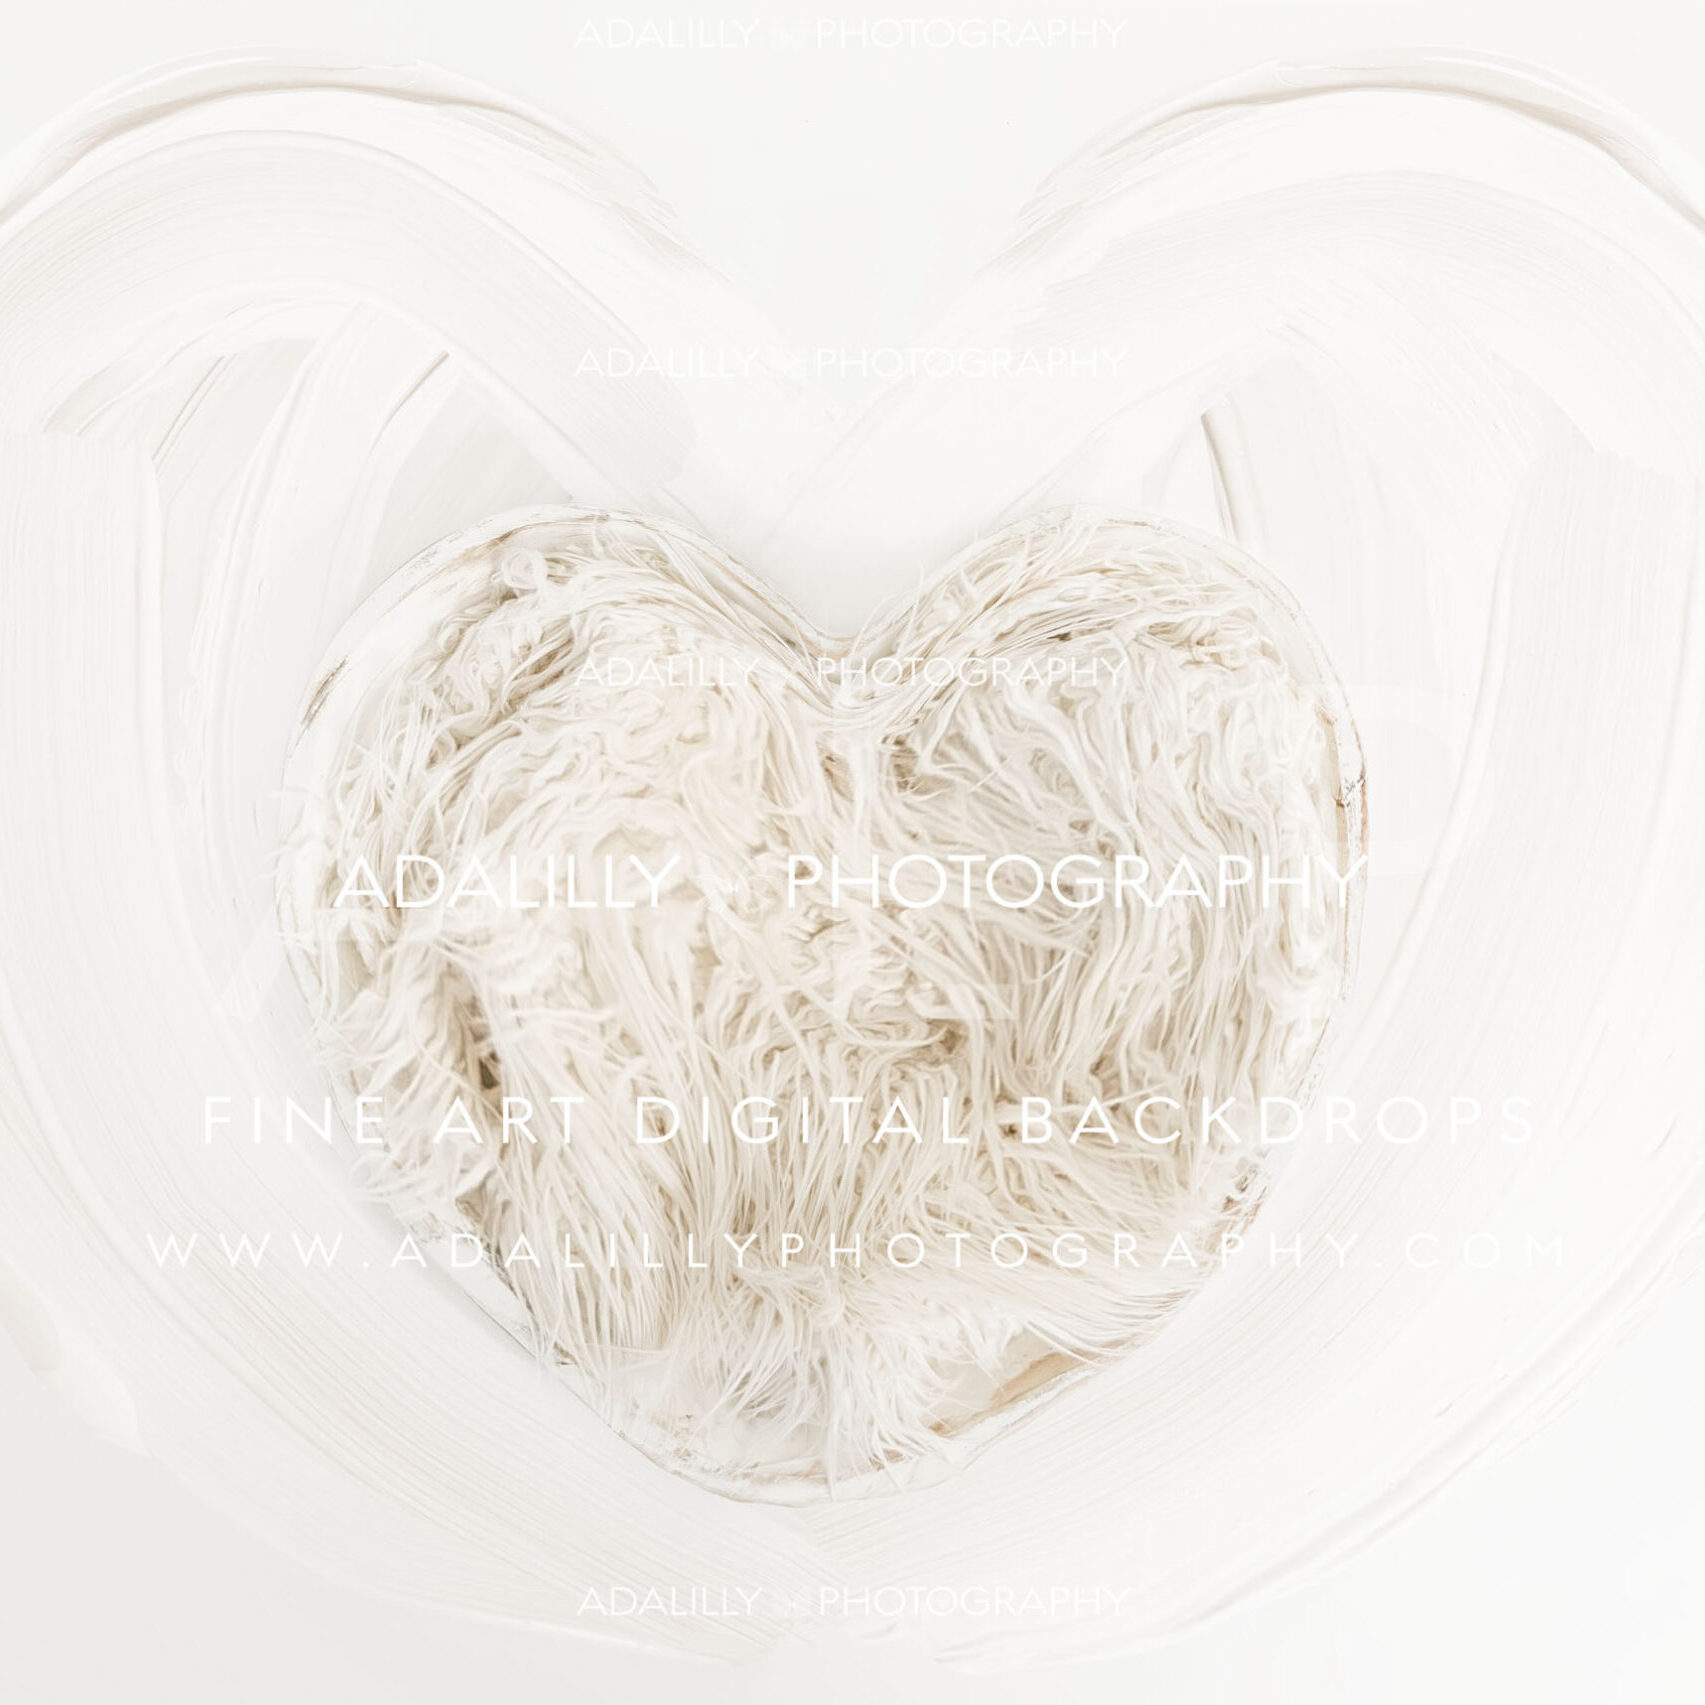 BE STILL MY HEART (NEUTRAL) - $15